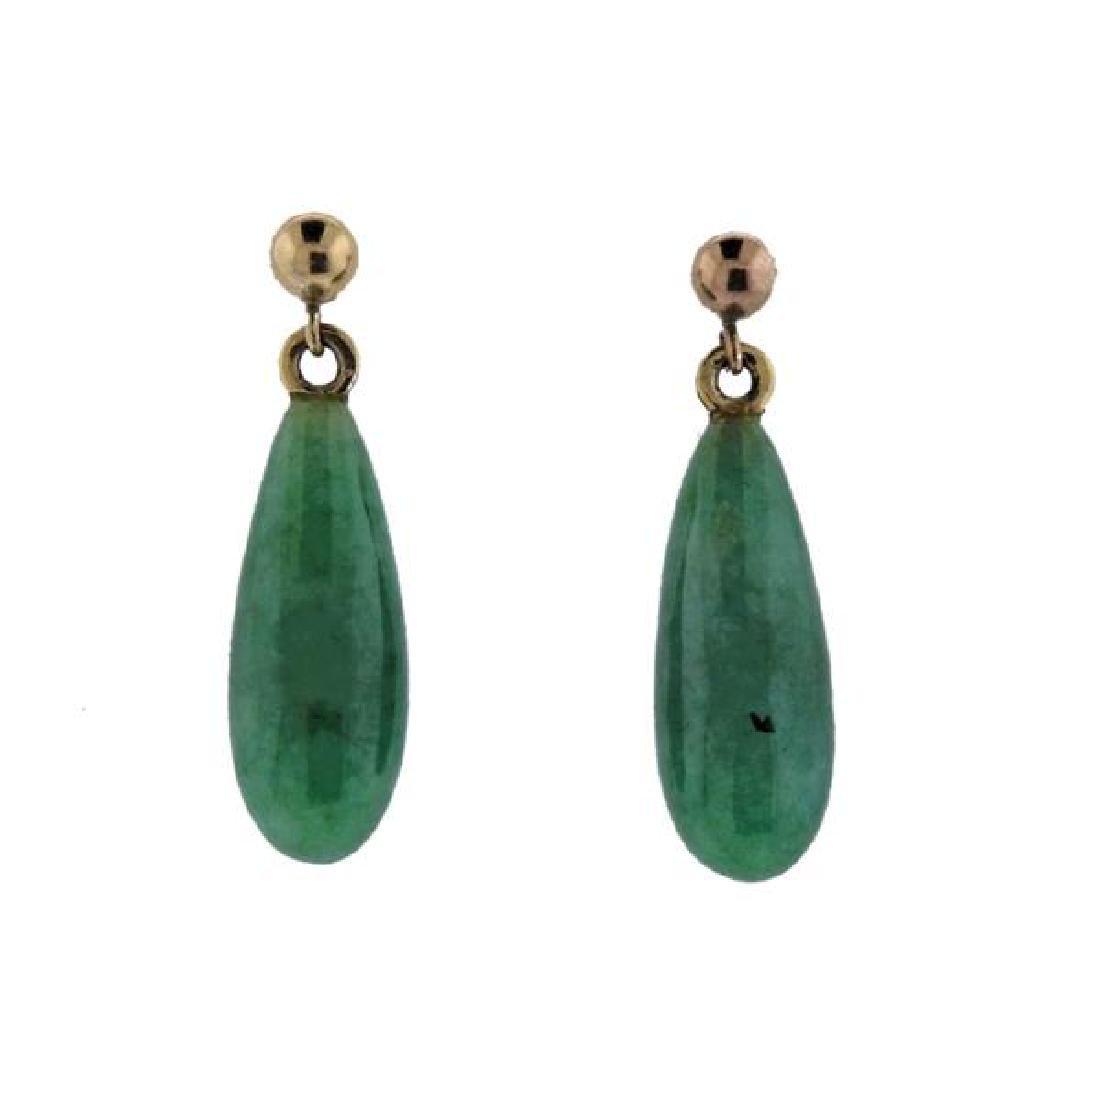 14K Gold Jade Drop Earrings